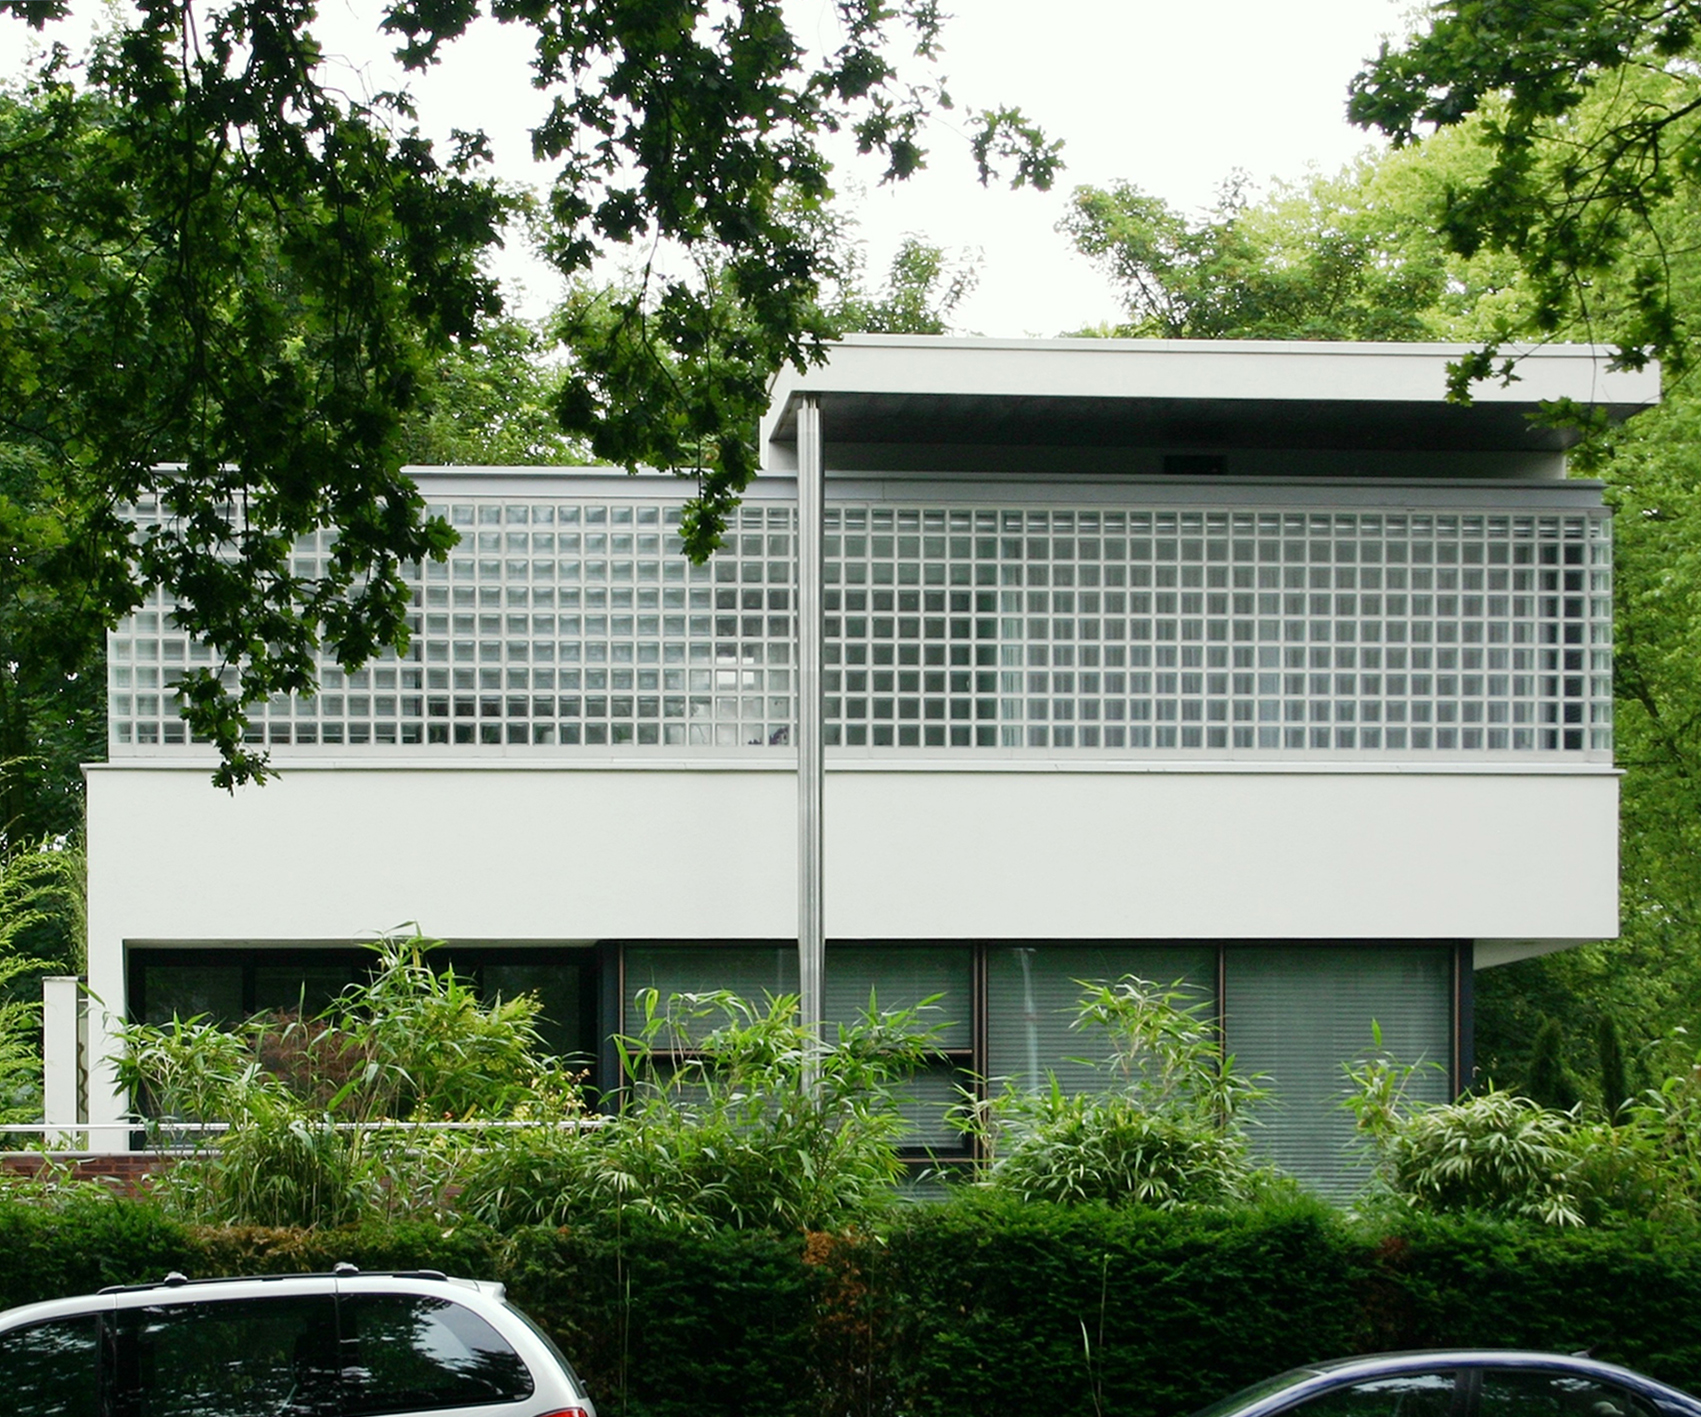 Architectenbureau Den Haag : Villa bliek archipelontwerpers architectenbureau den haag